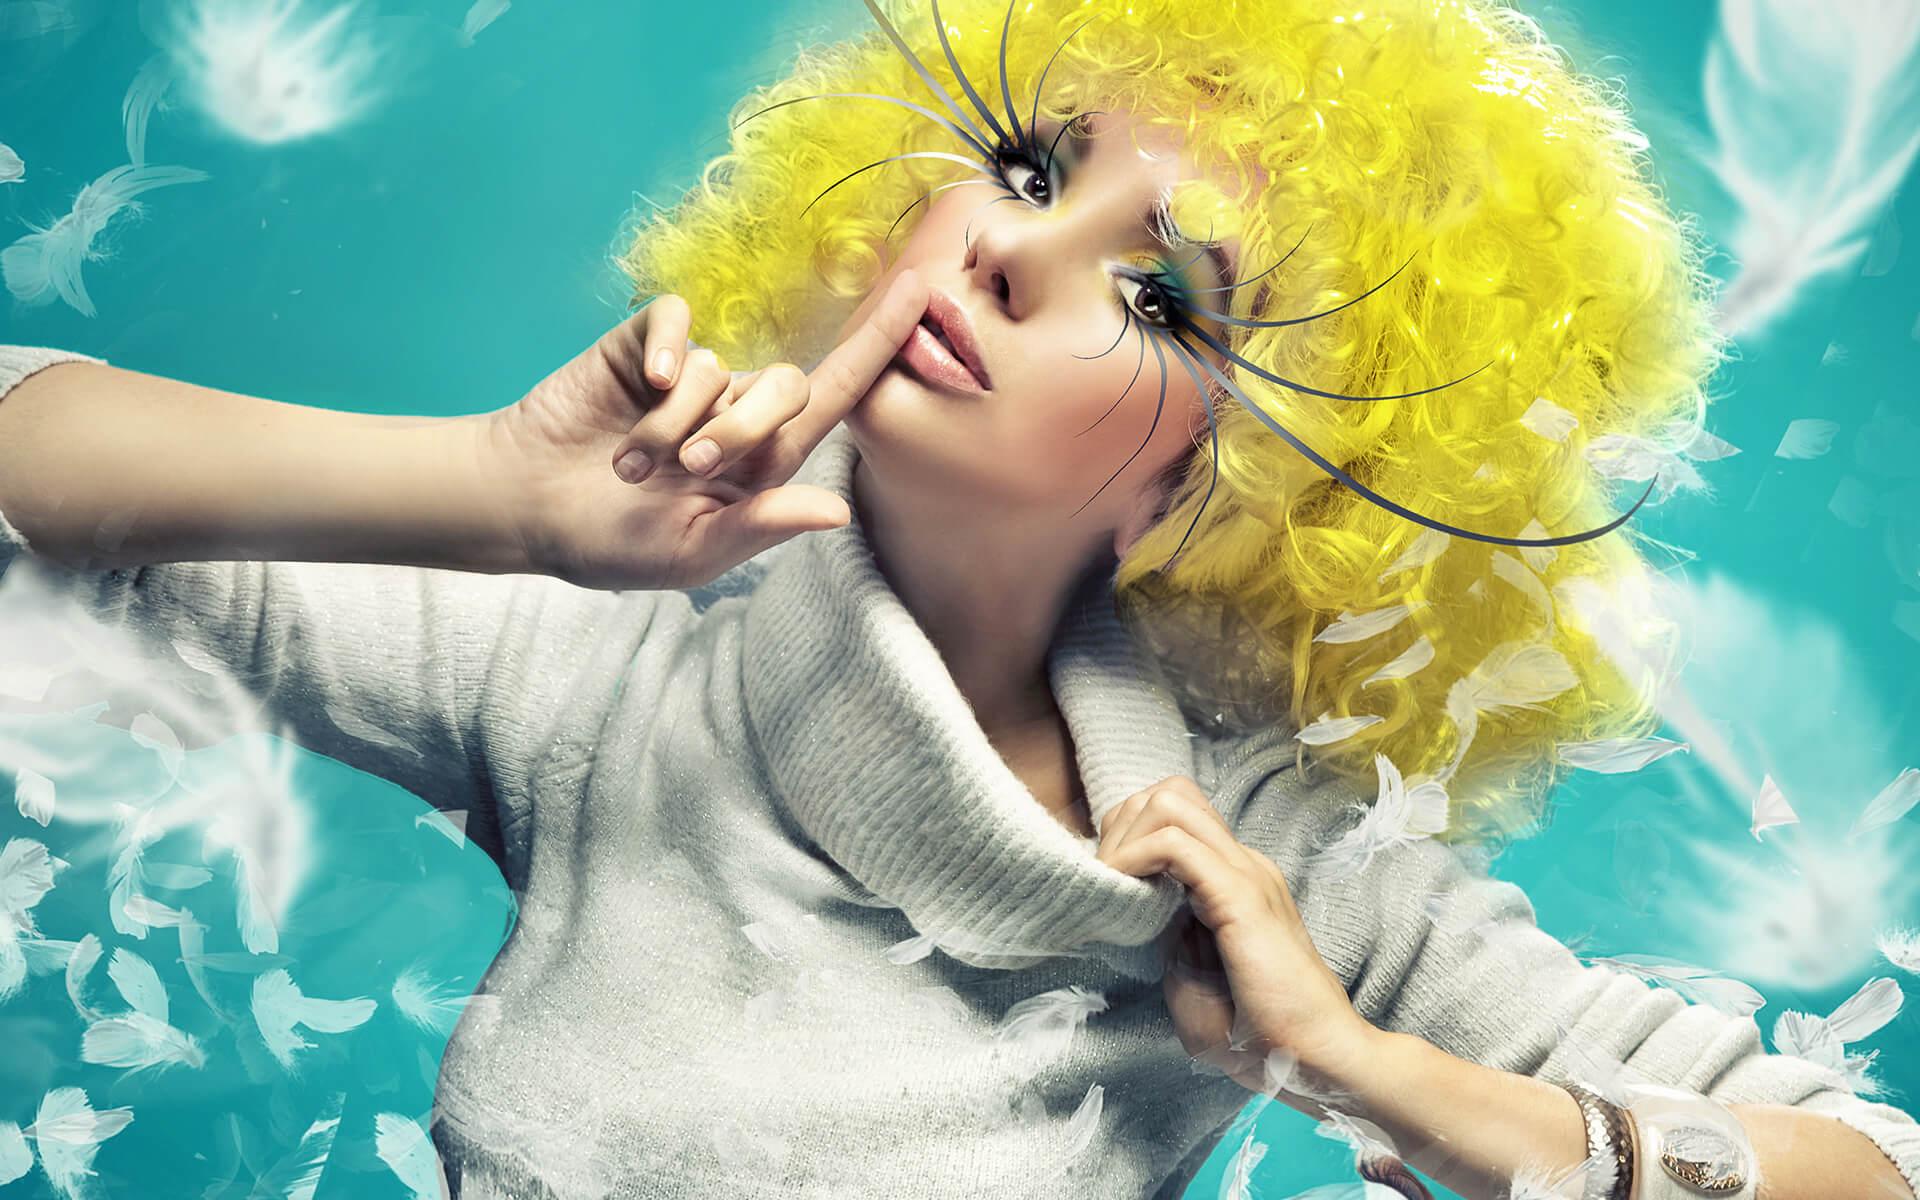 A yellow hair girl